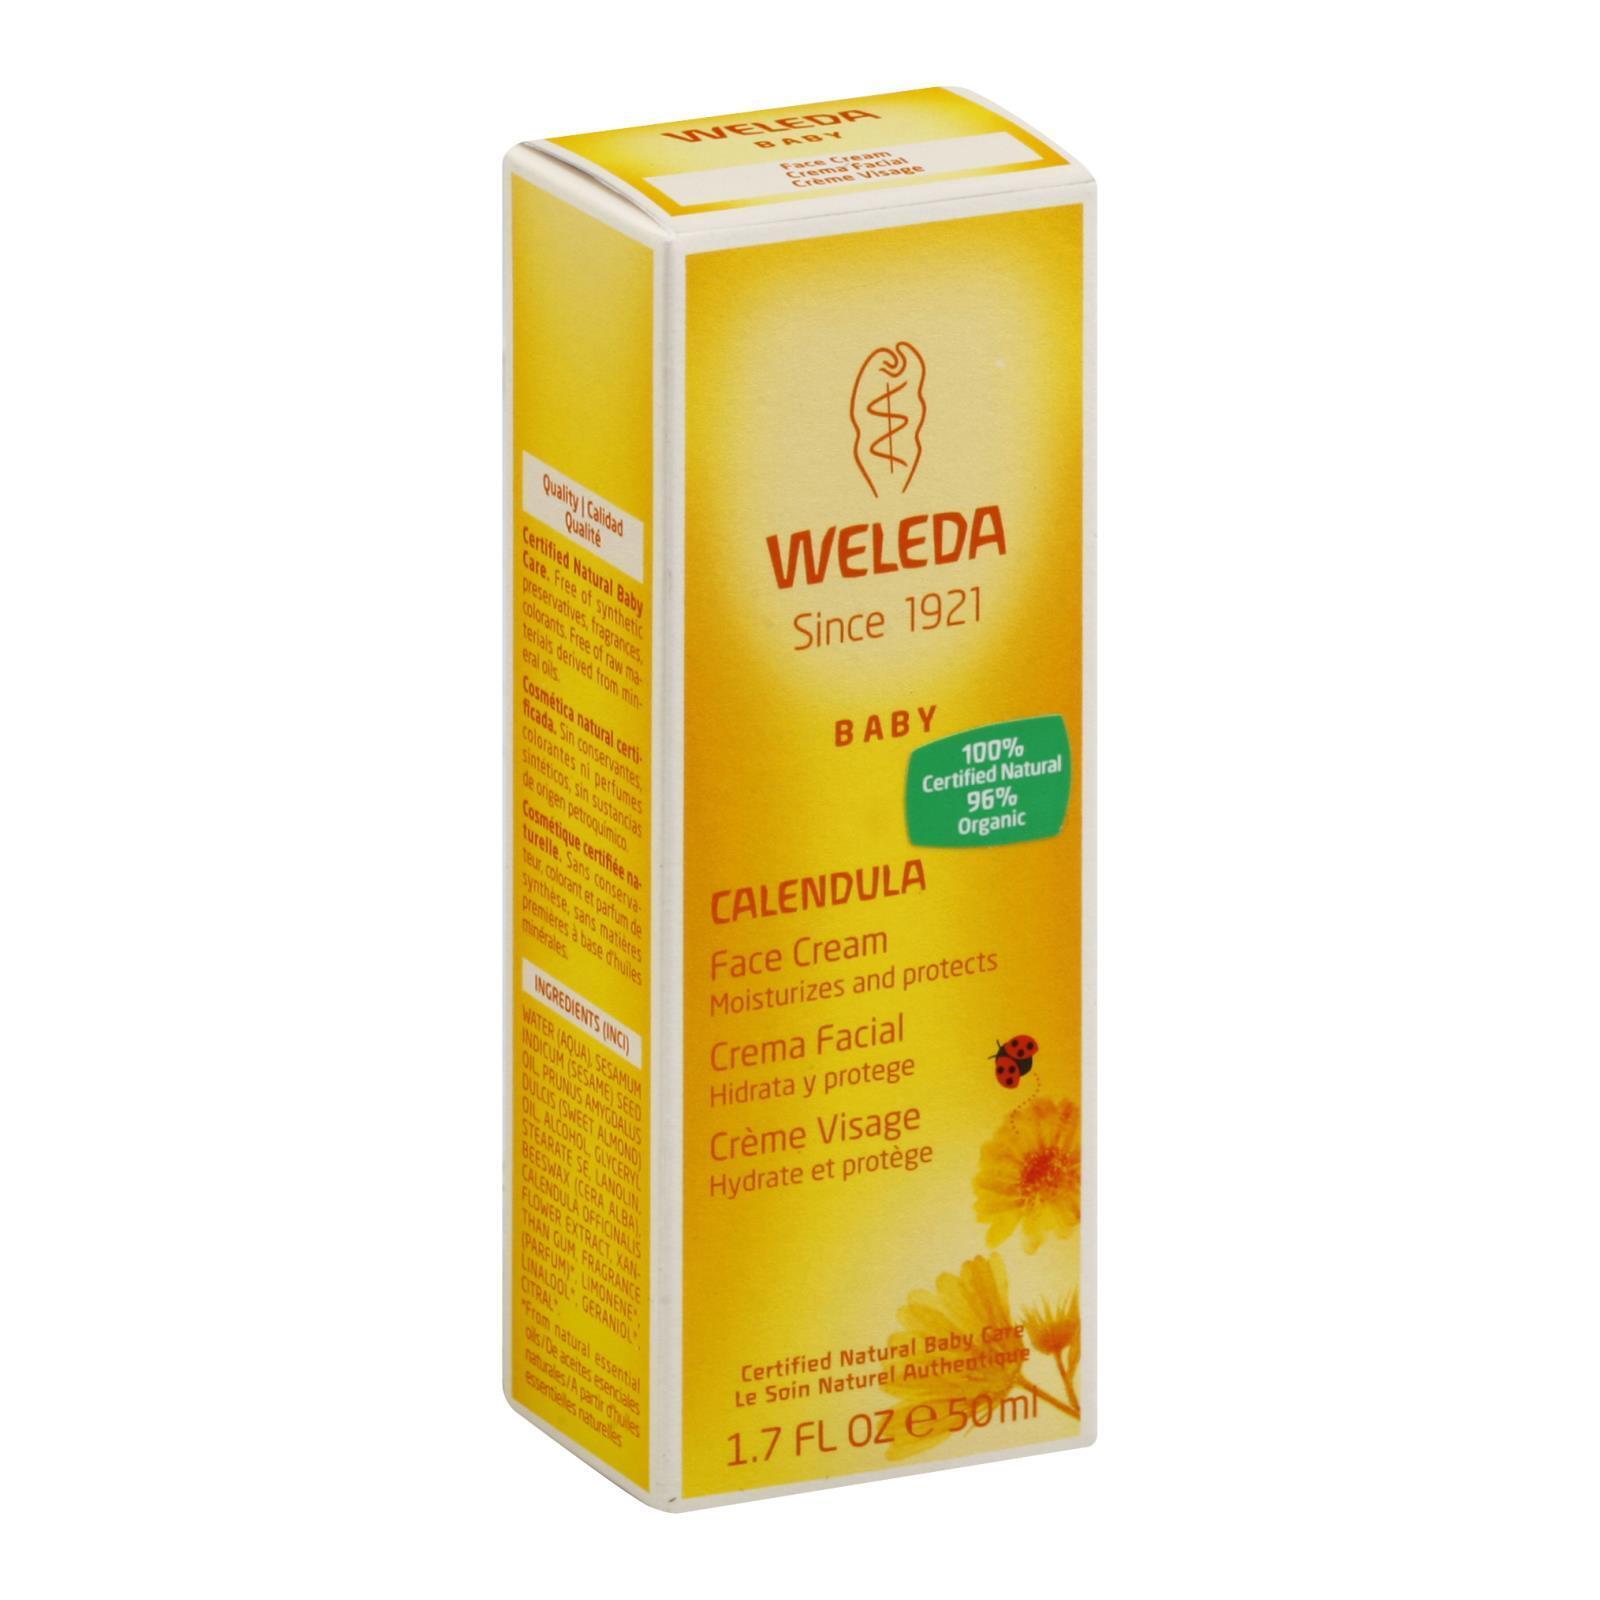 Weleda Calendula Face Cream - 1.7 fl oz